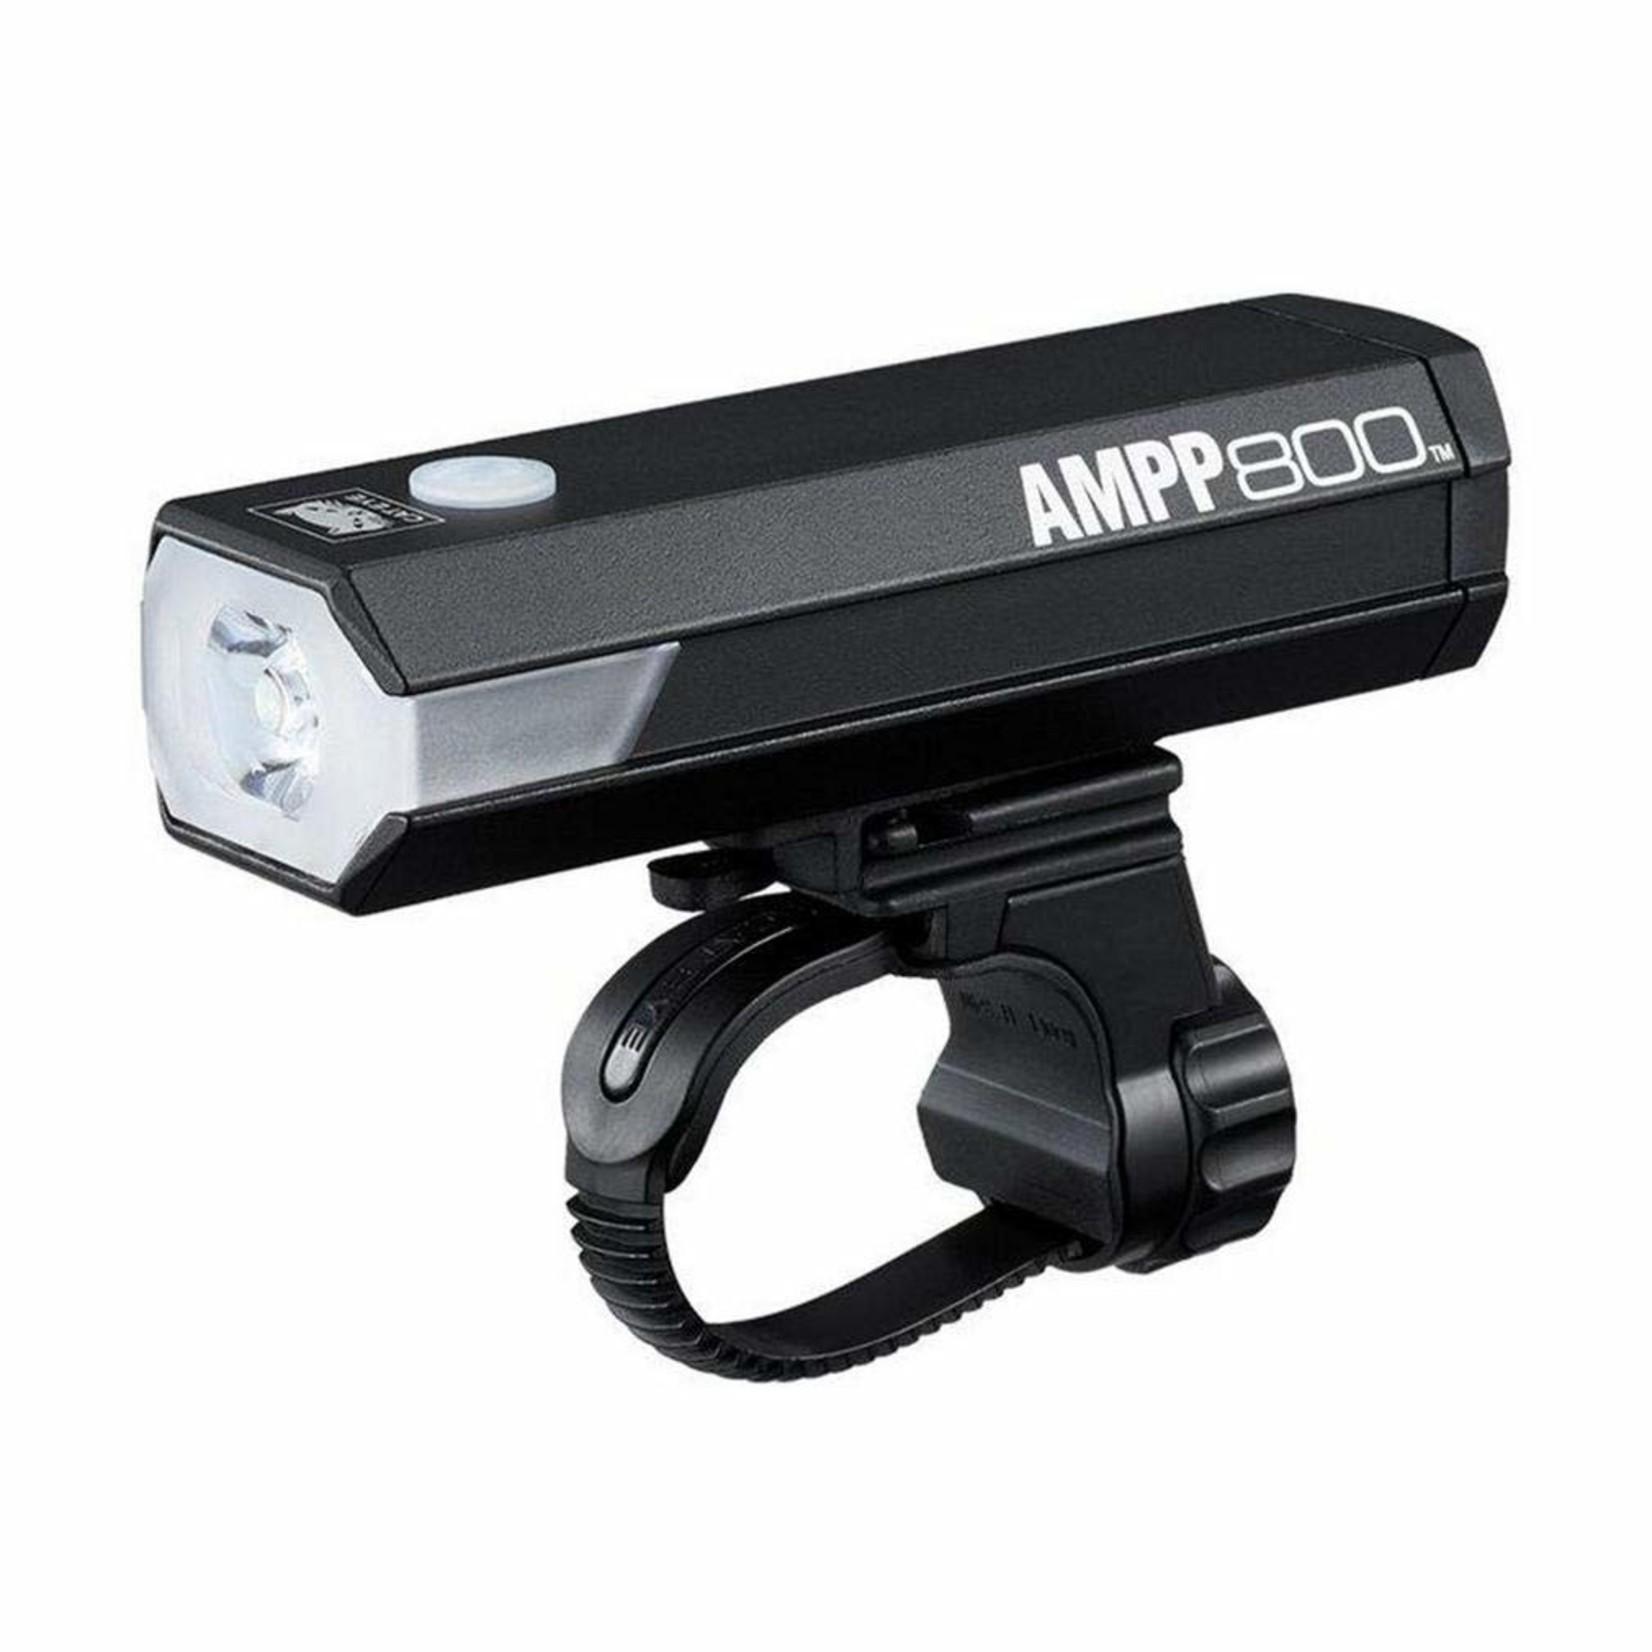 Cateye Cateye, Light Front Ampp 800 Black